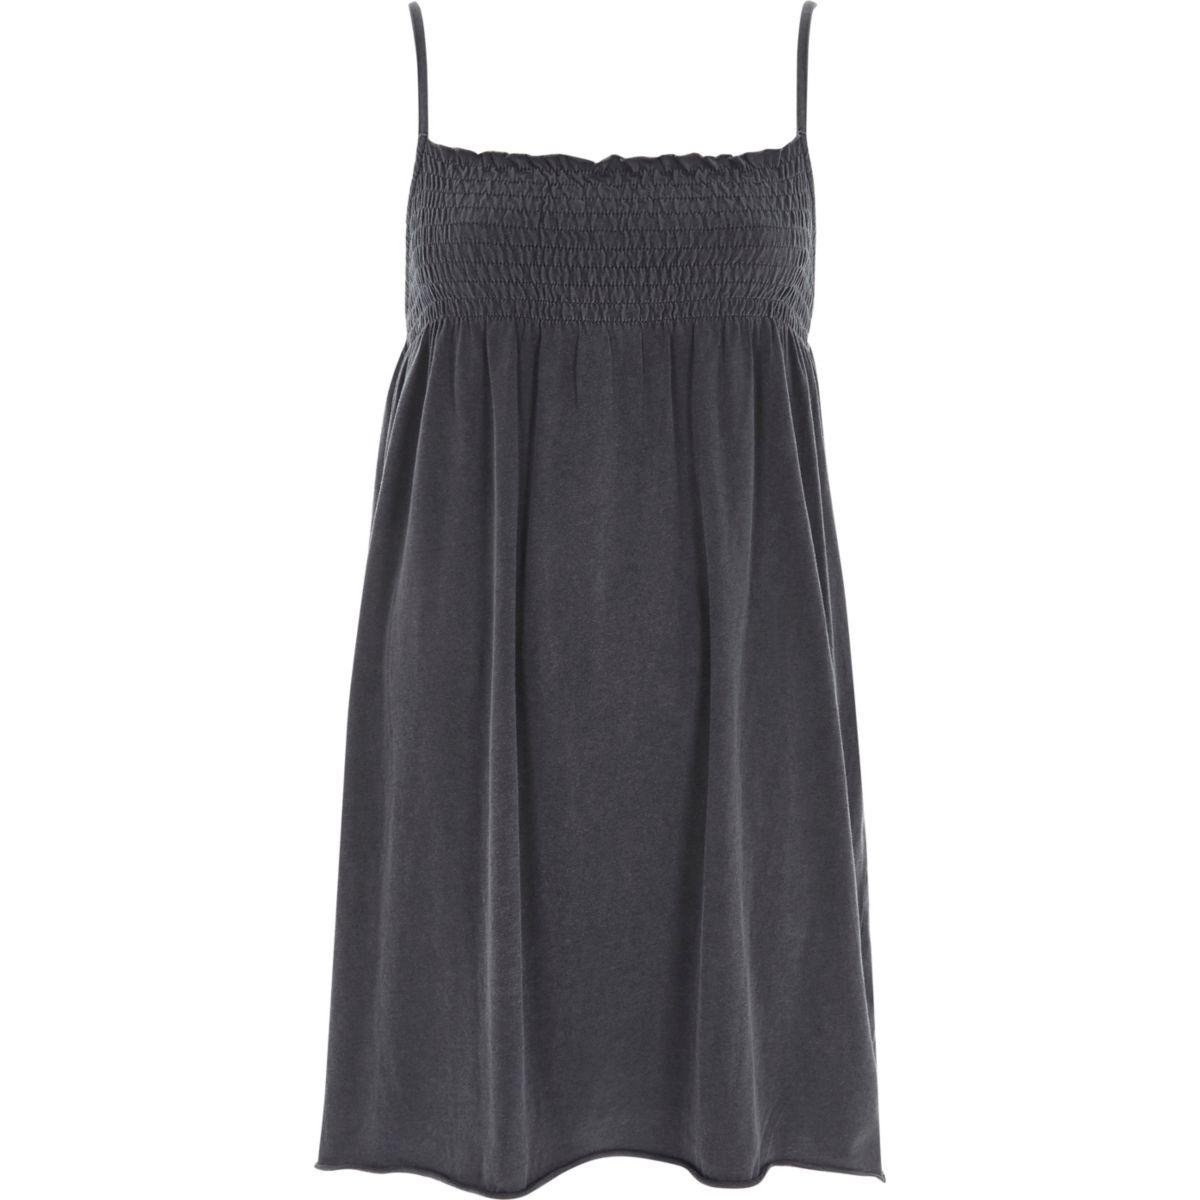 Dark grey shirred jersey cami dress